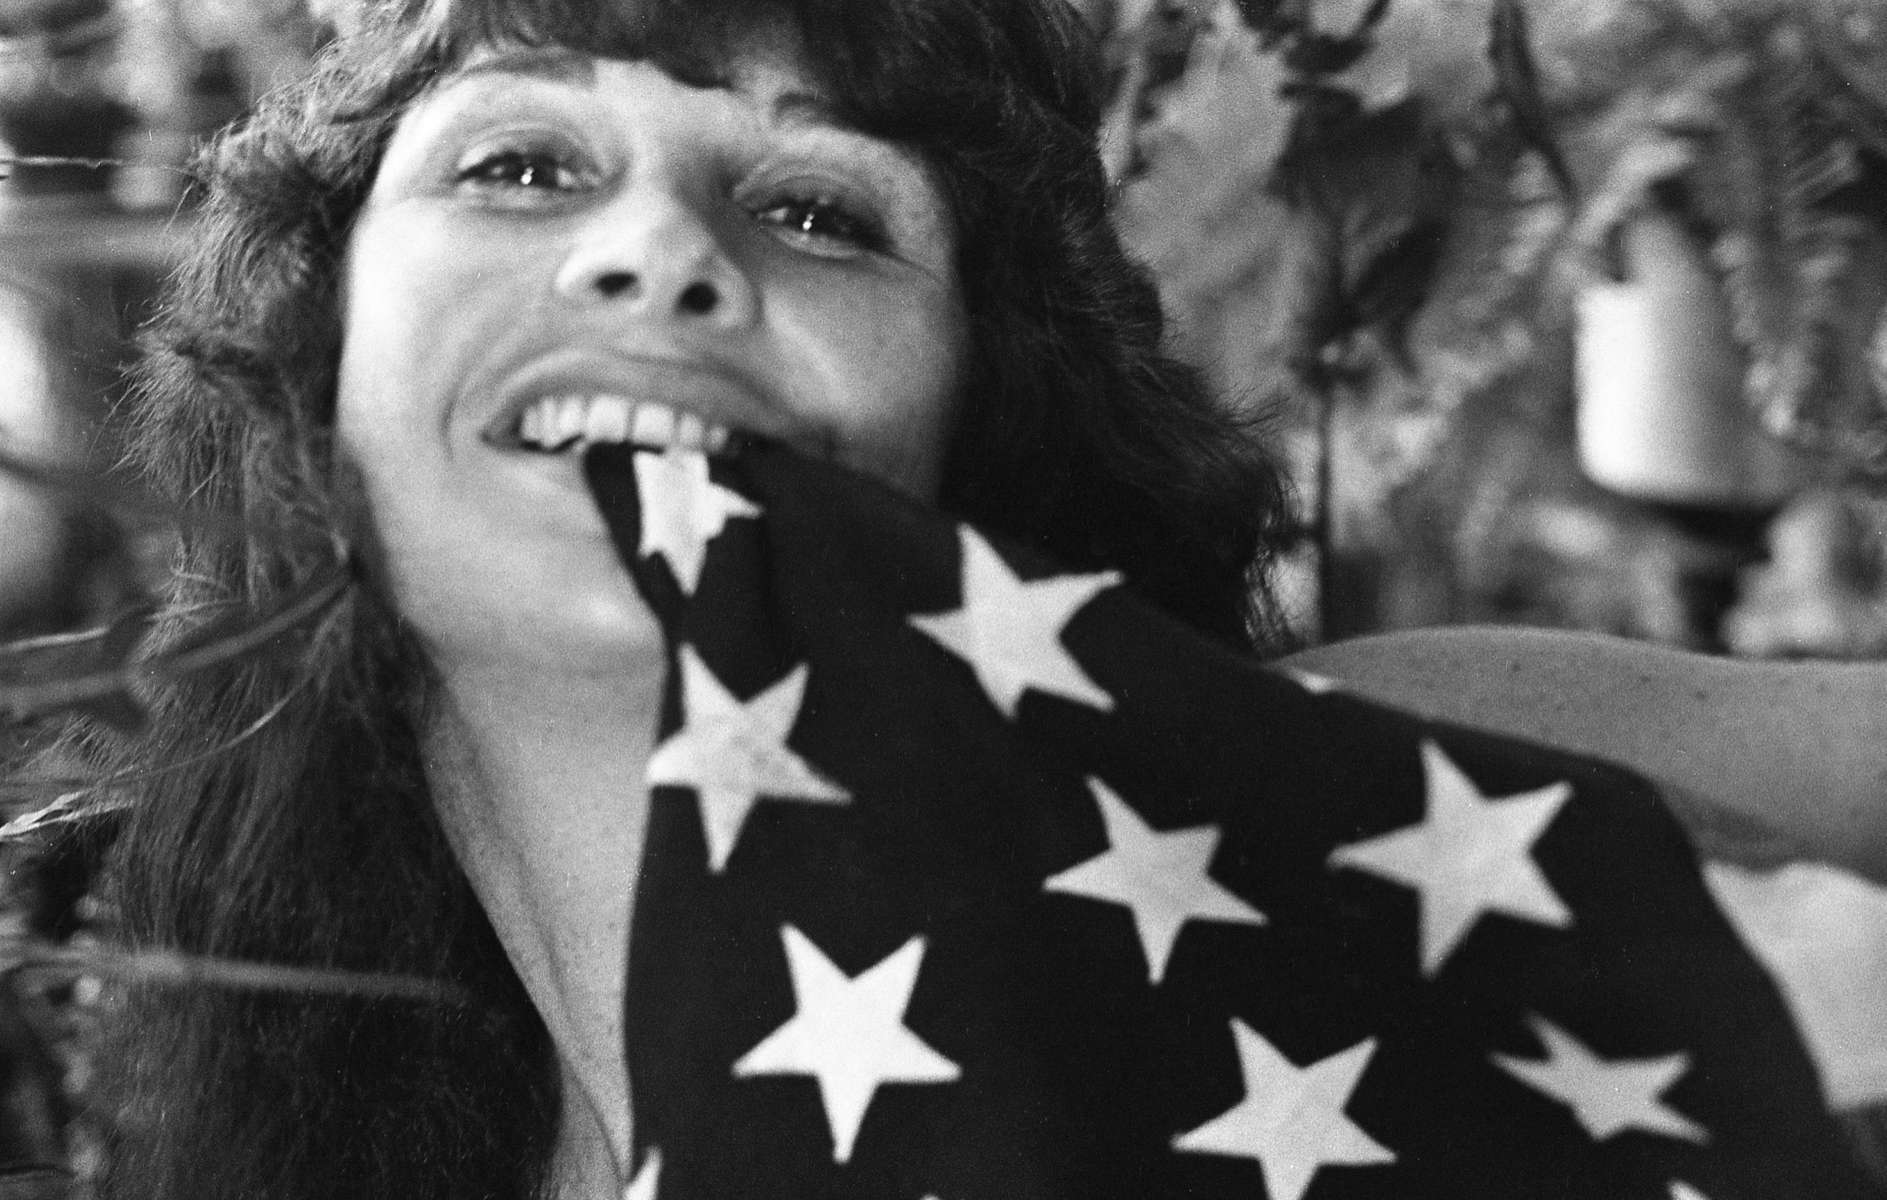 Woman Biting Flag, Aspen, CO